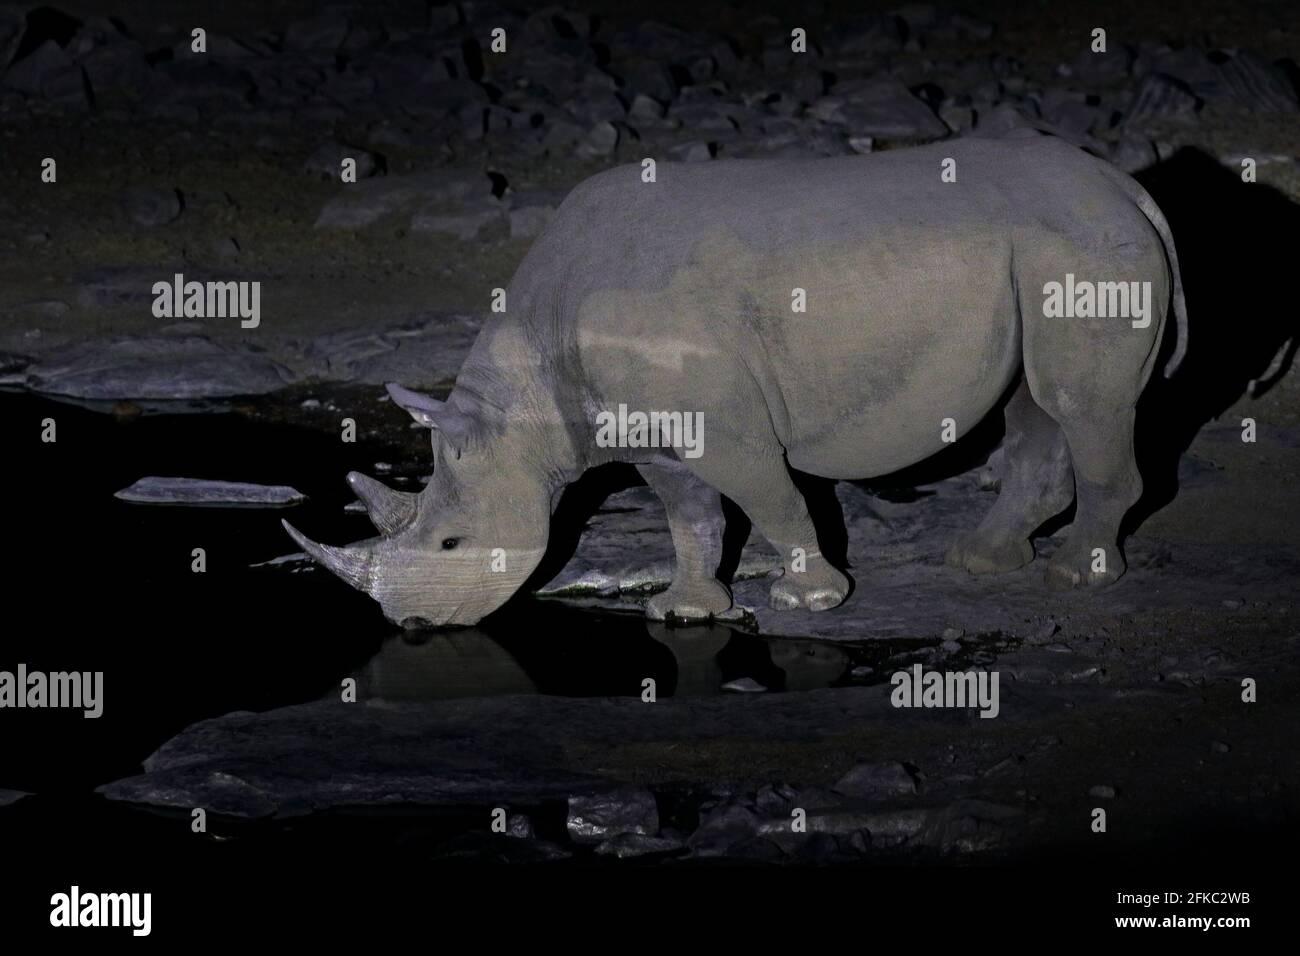 Rhino near the water hole, night in sand desert, Etocha NP, Namibia, Africa. Black rhinoceros or hook-lipped rhinoceros, Diceros bicornis, in the natu Stock Photo